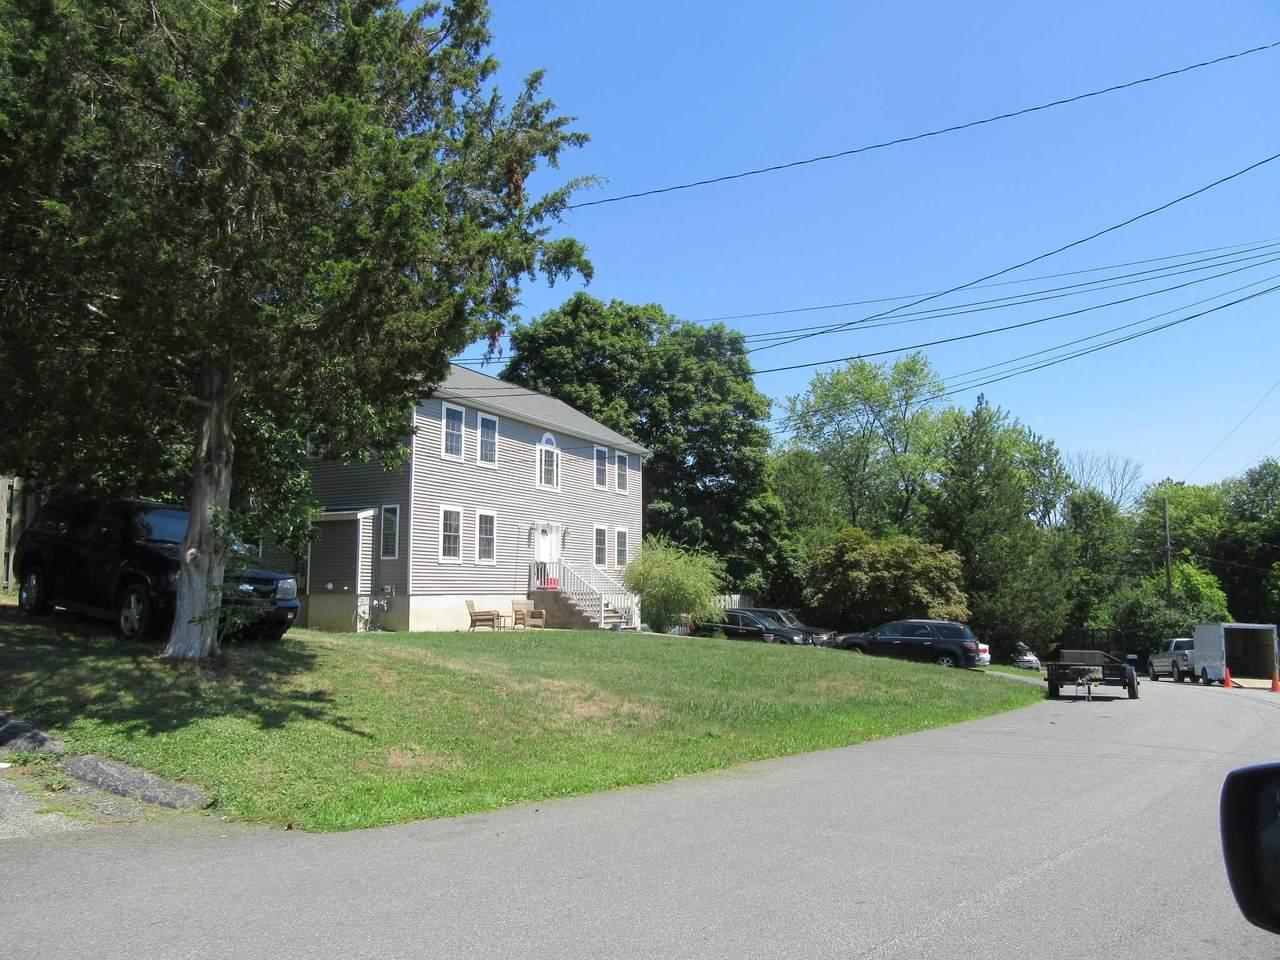 33 Cumberland Rd - Photo 1